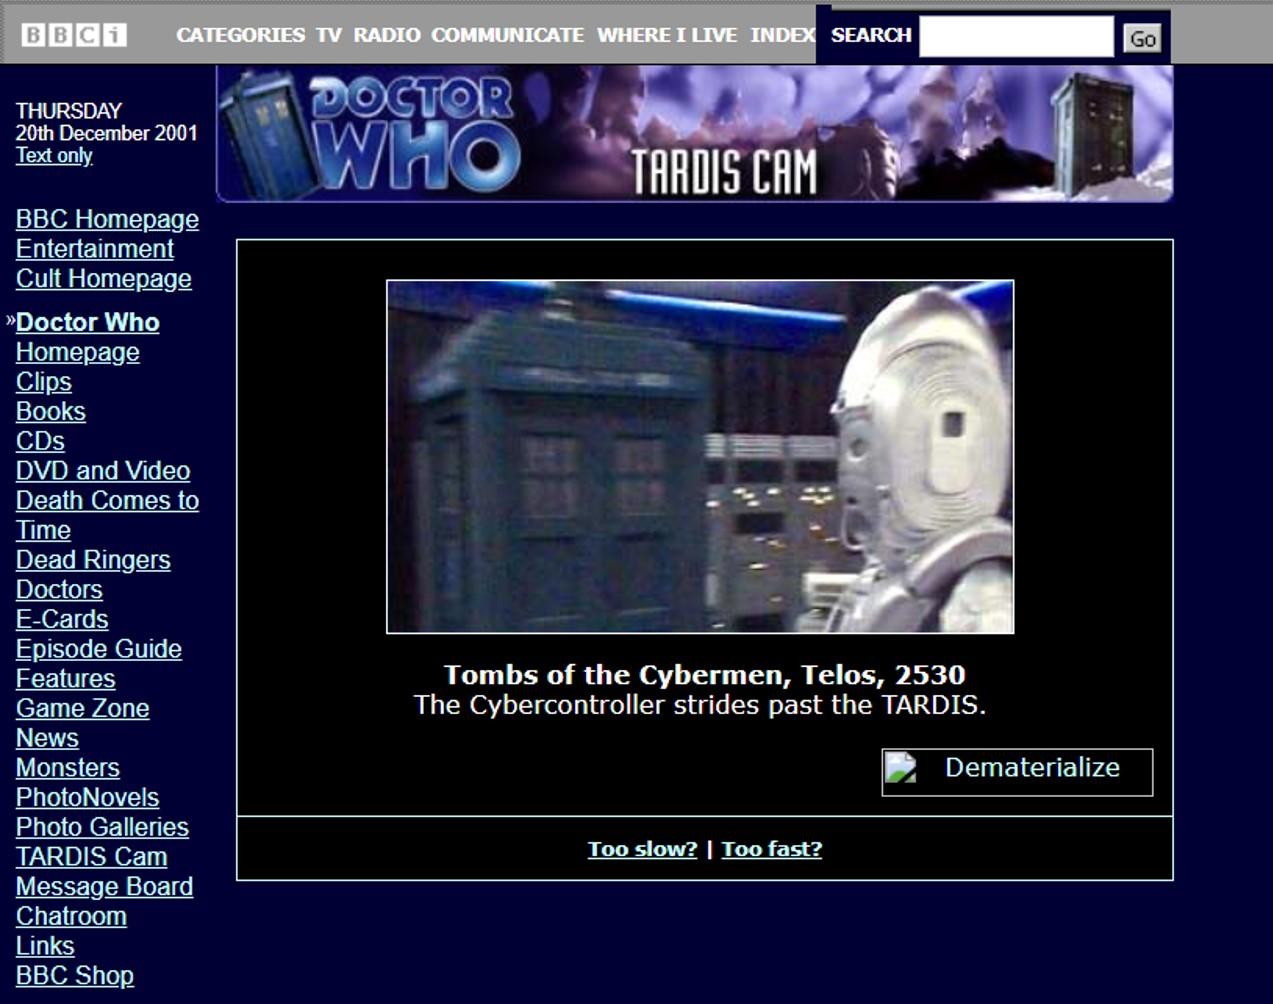 TARDIS Cam (series)